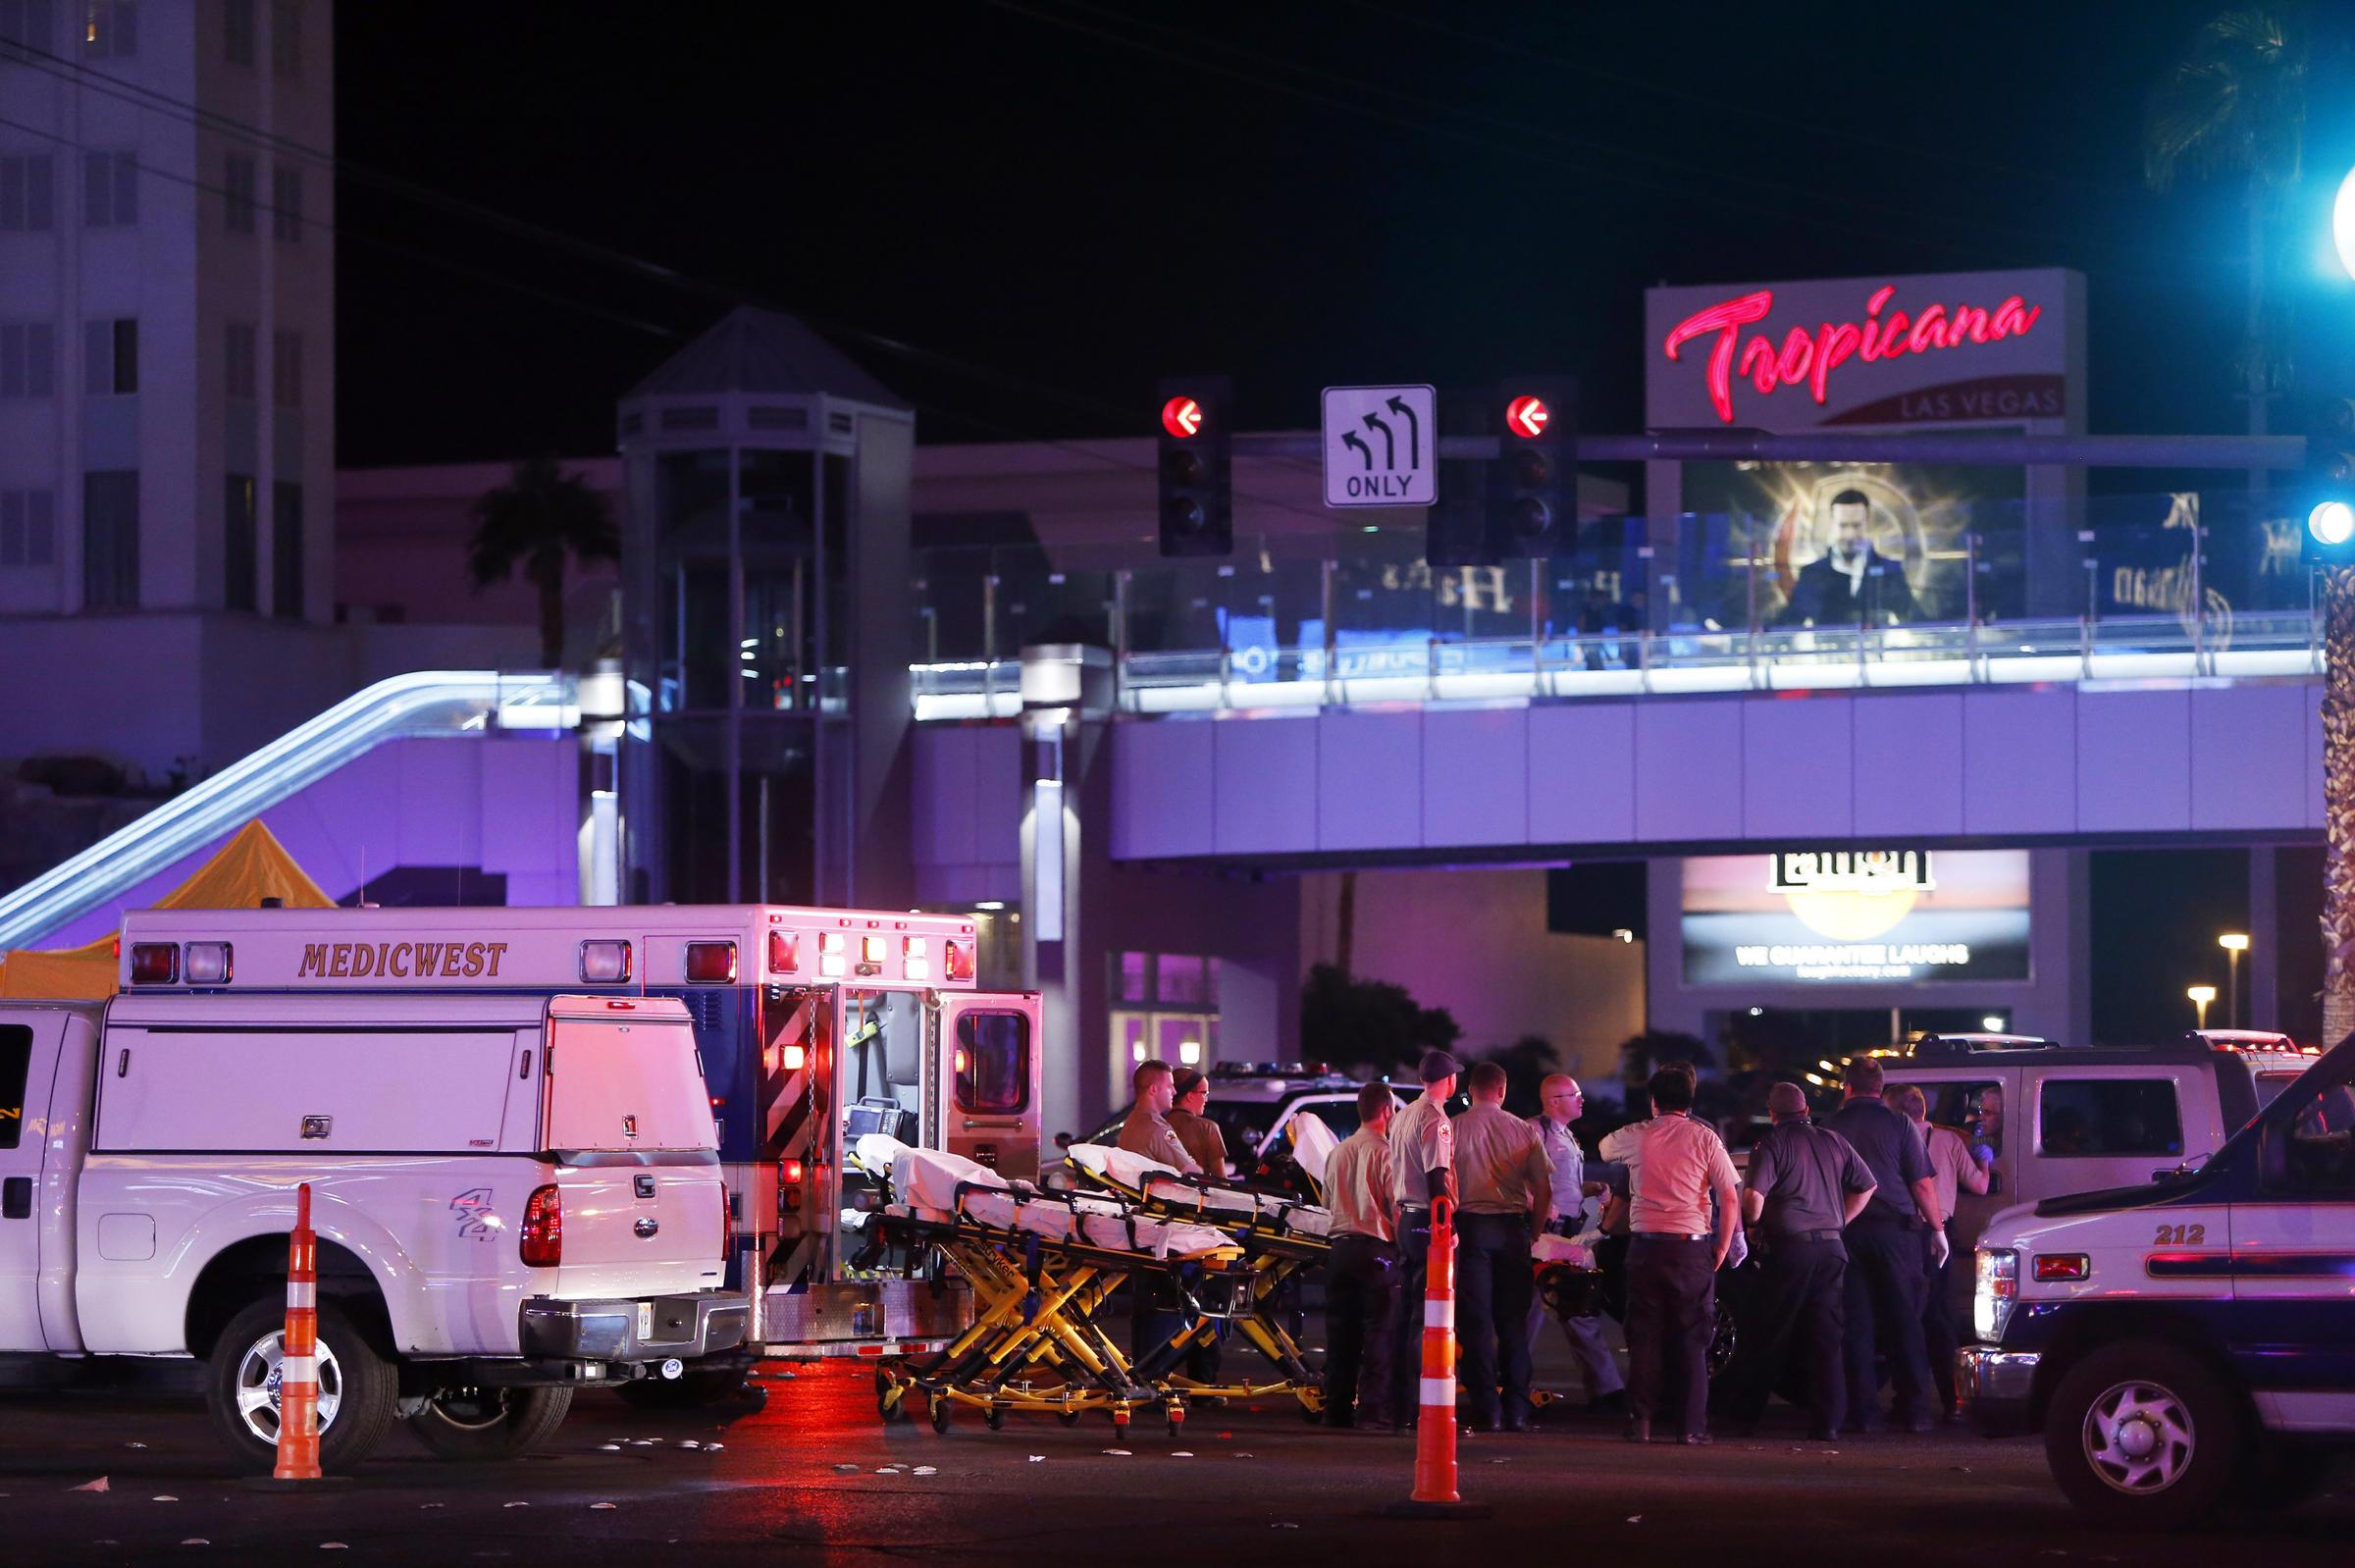 Las Vegas Shooting Update: At Least 59 People Are Dead After Gunman